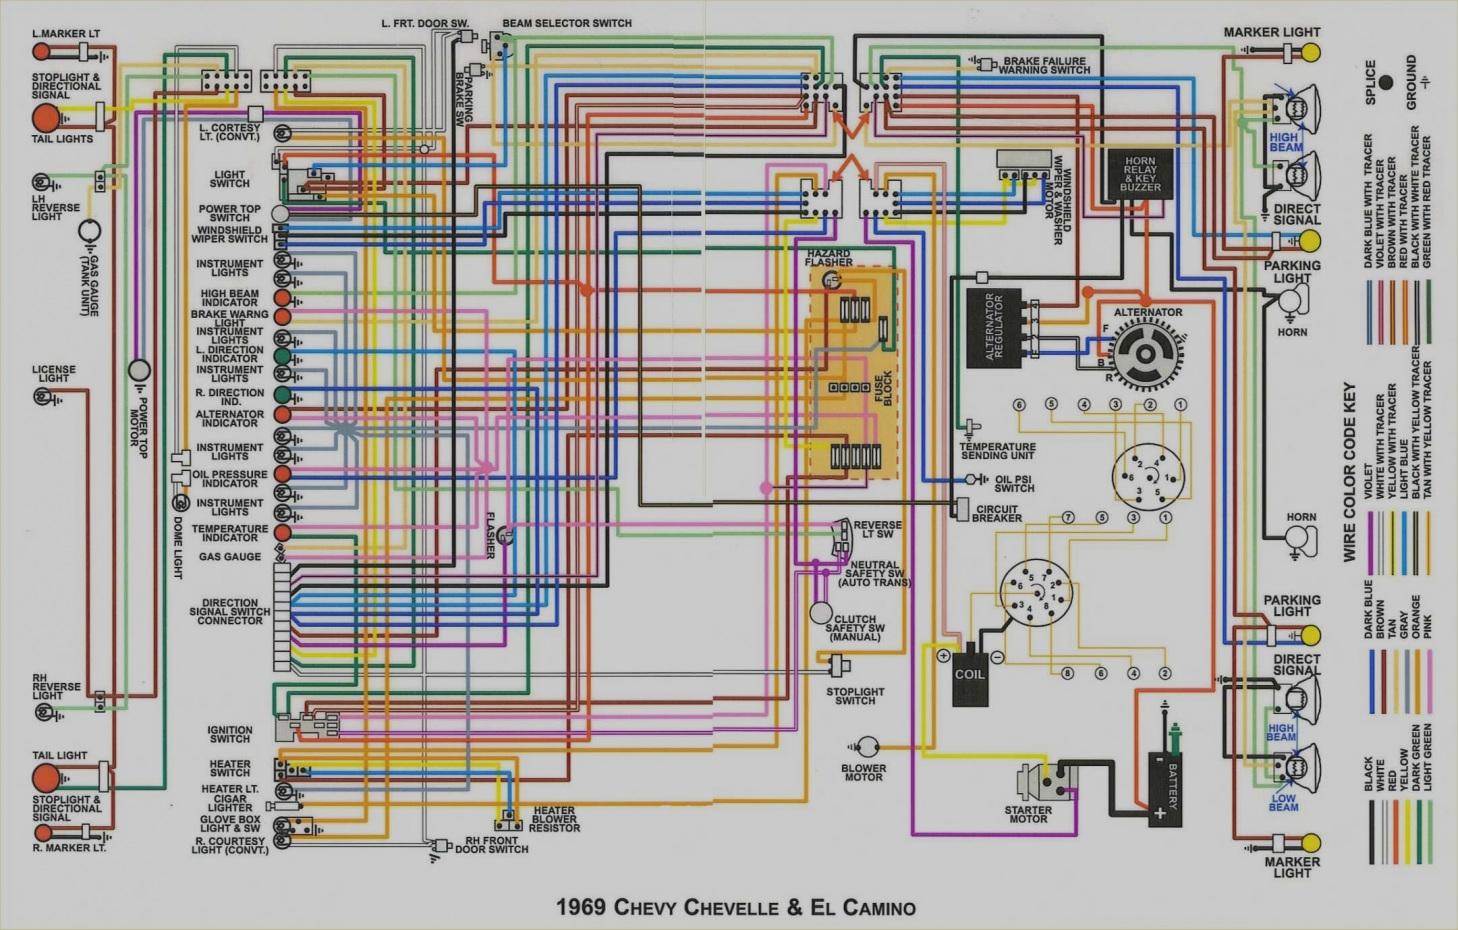 hight resolution of 1969 firebird wiring diagram 1969 firebird wiring diagram collection 25 trend wiring diagrams for alternator